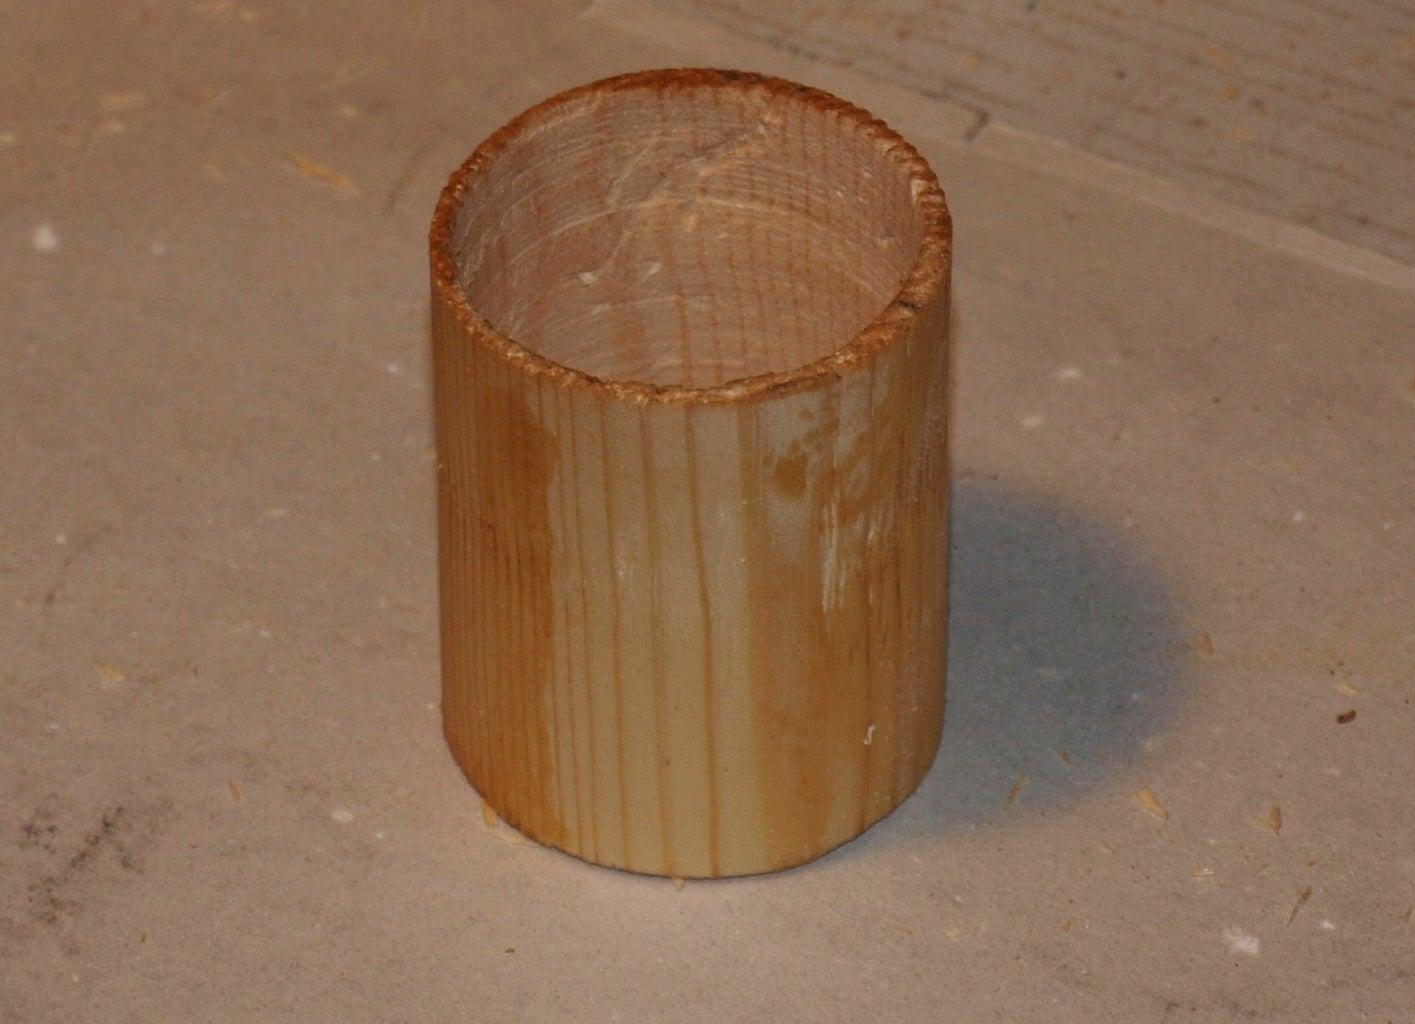 Turning the Cylinder